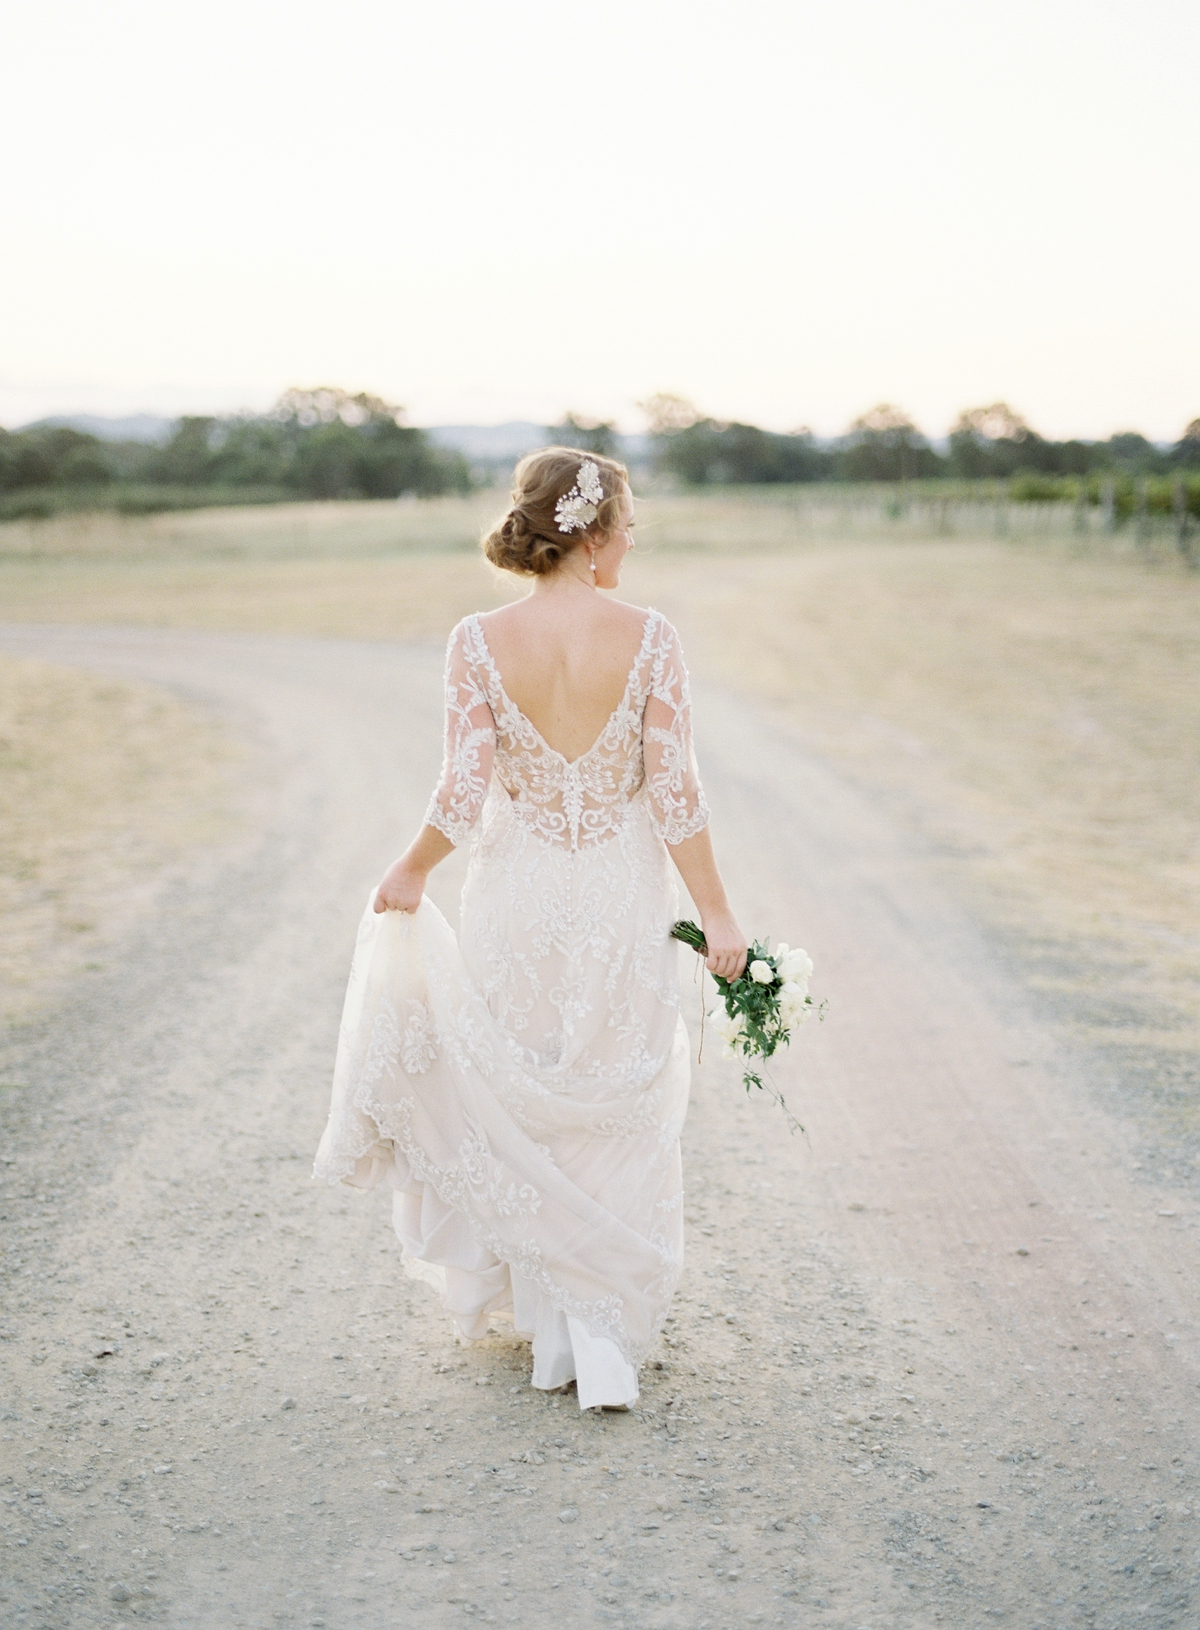 The Vine Grove Mudgee Wedding, Photography by Mr Edwards_1833.jpg